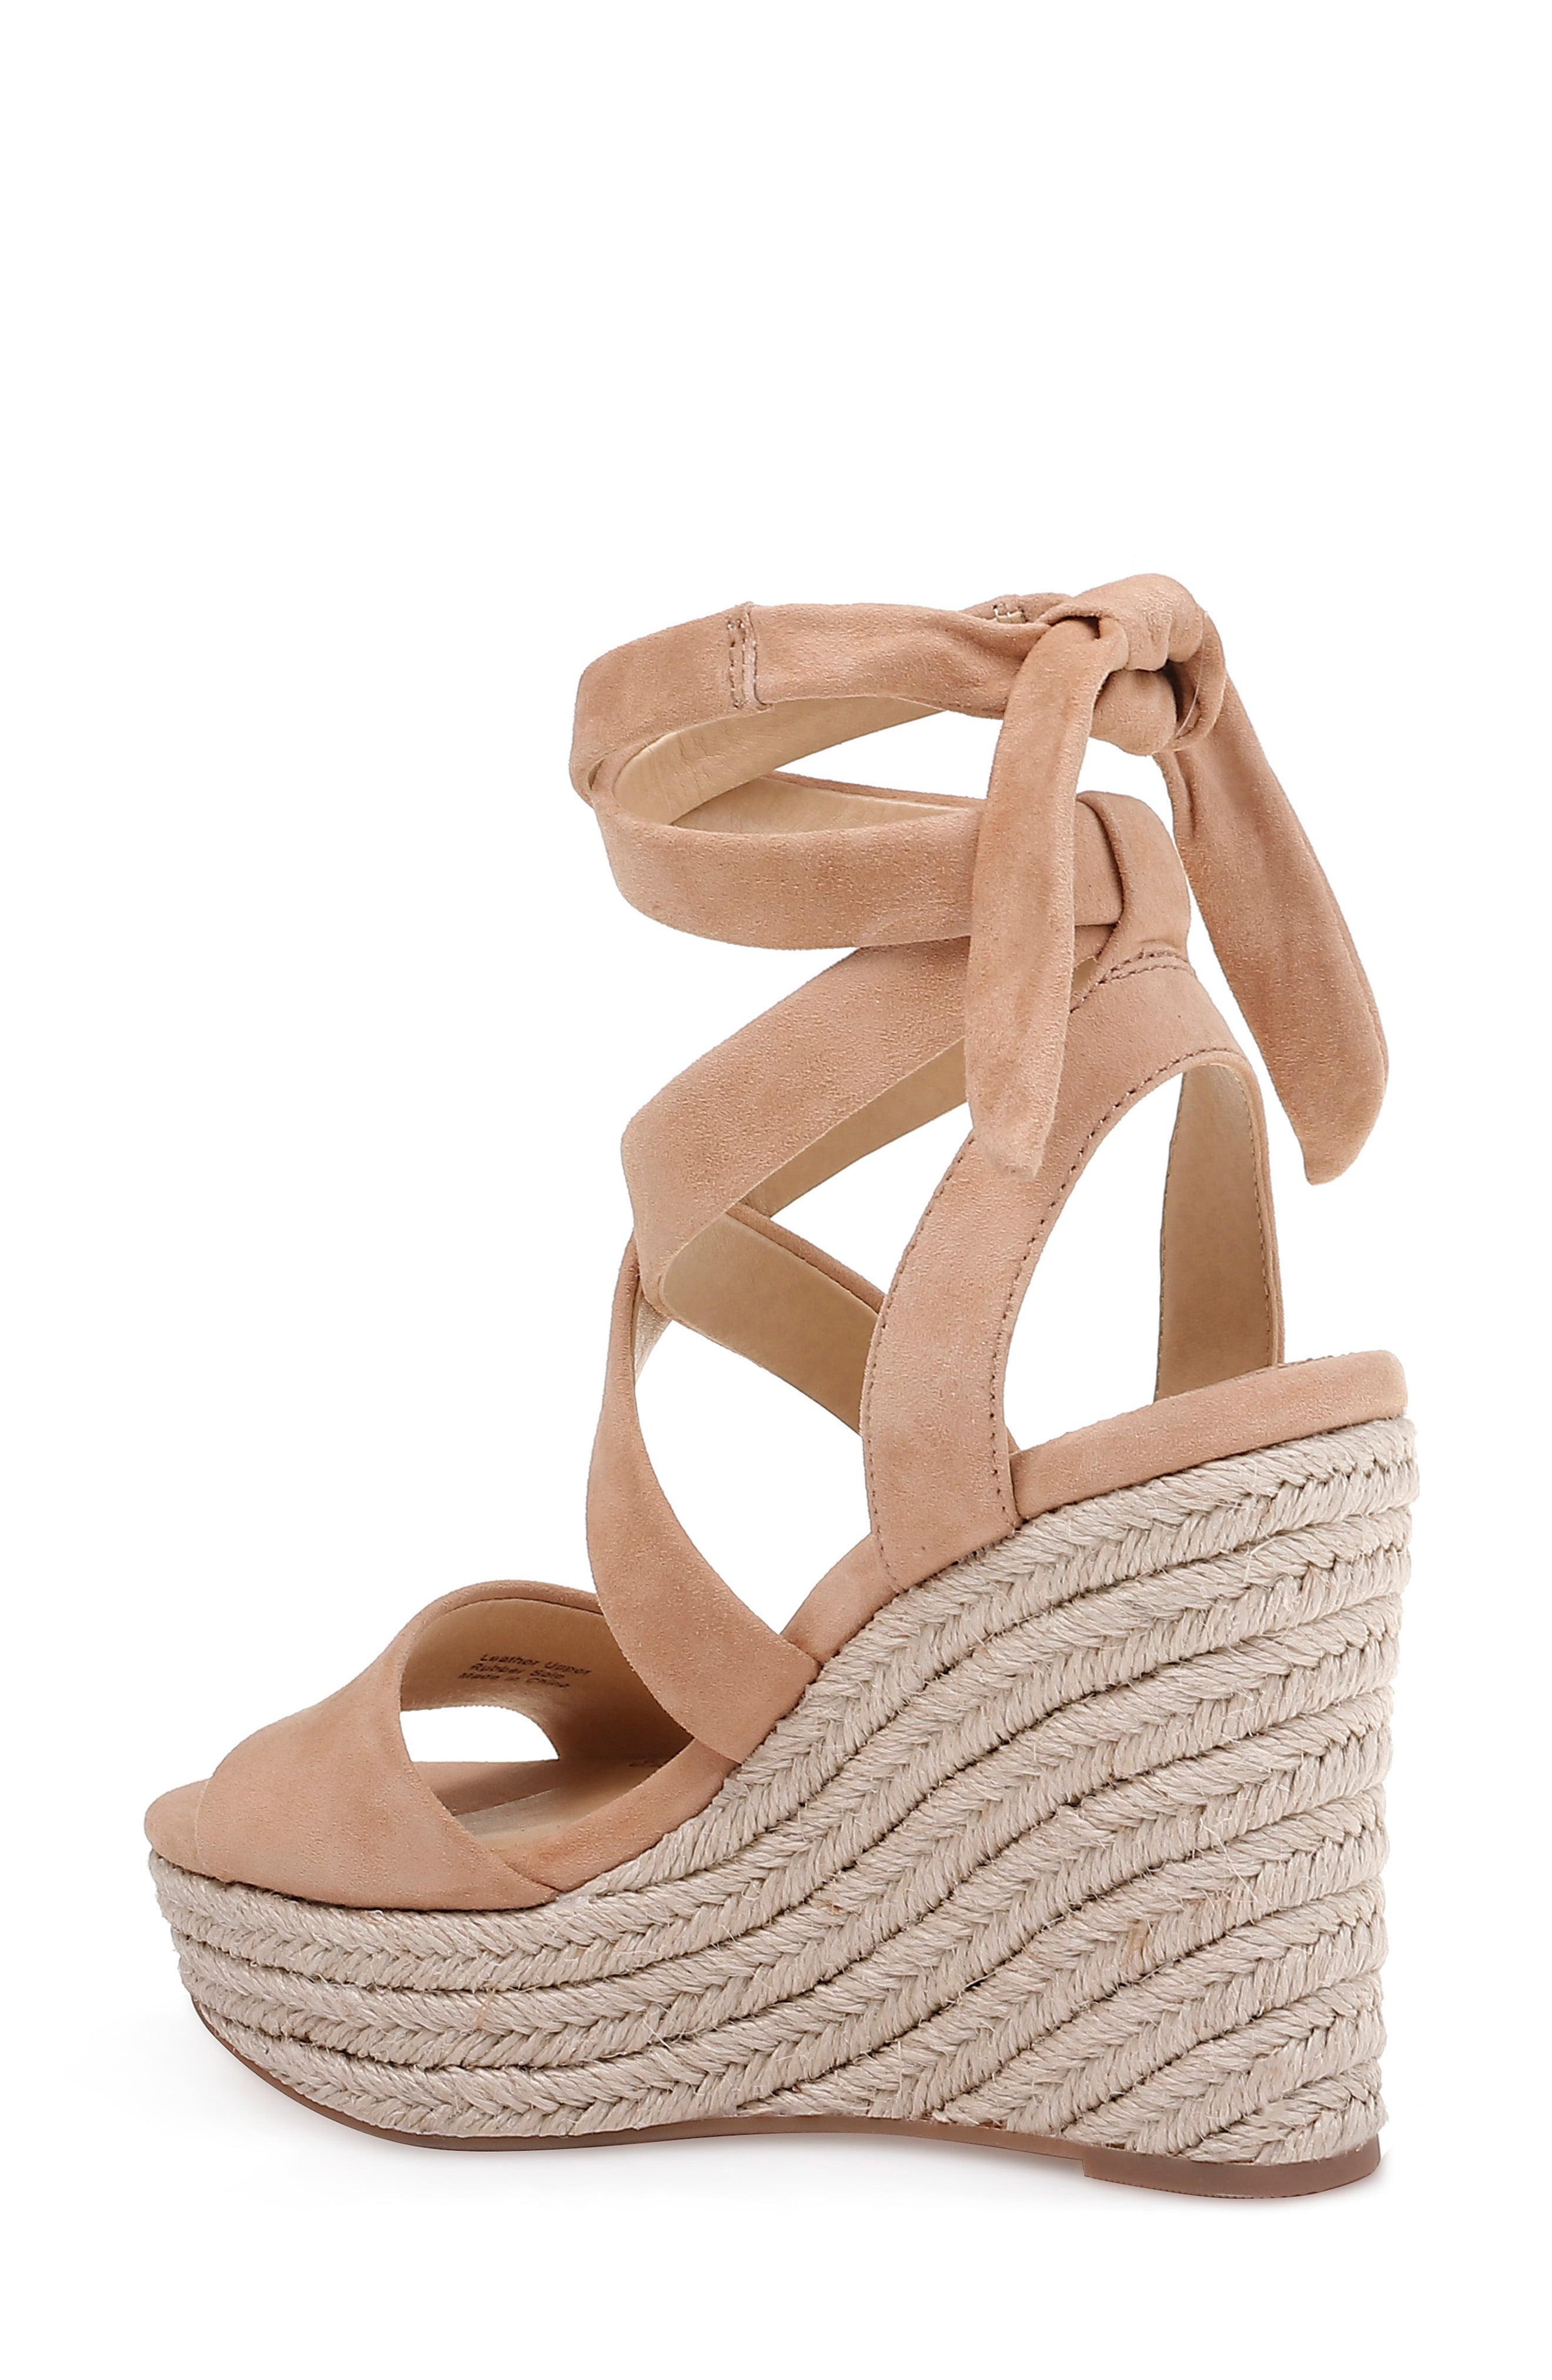 6ee9de8b53cf Splendid - Brown Women s Tessie Ankle-tie Wedge Sandals - Lyst. View  fullscreen